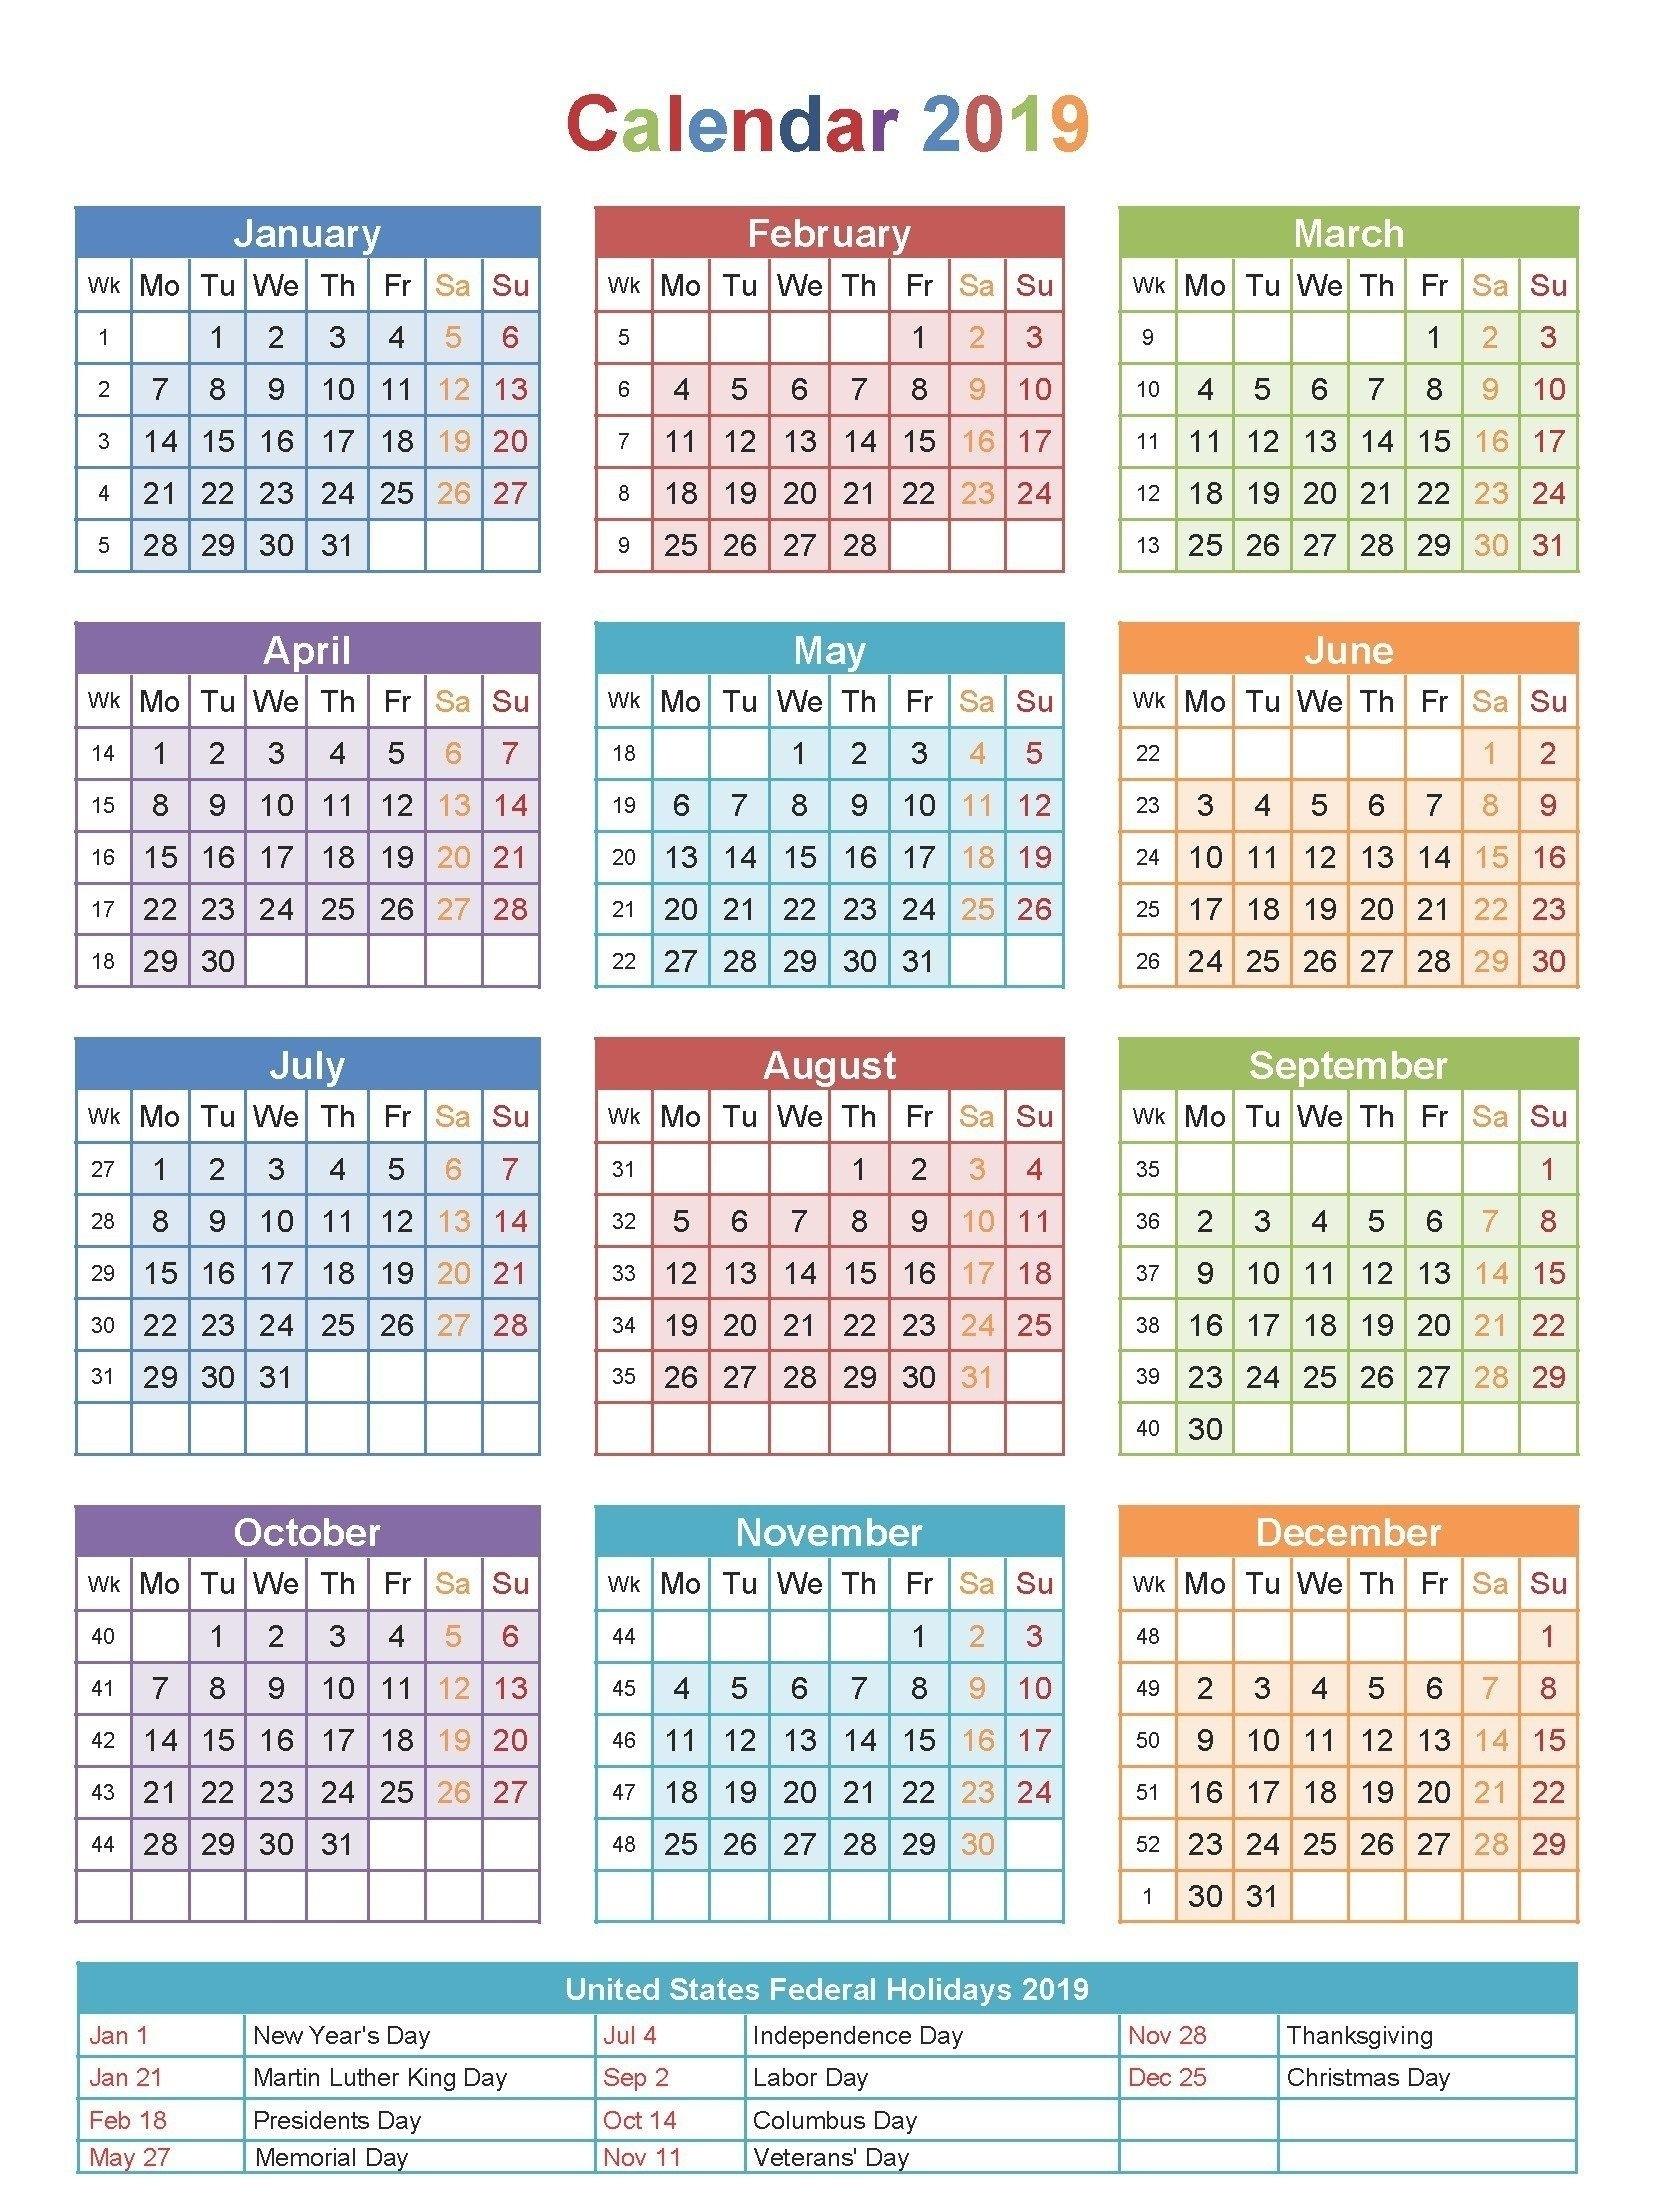 2020 Usps Pay Periods - Template Calendar Design